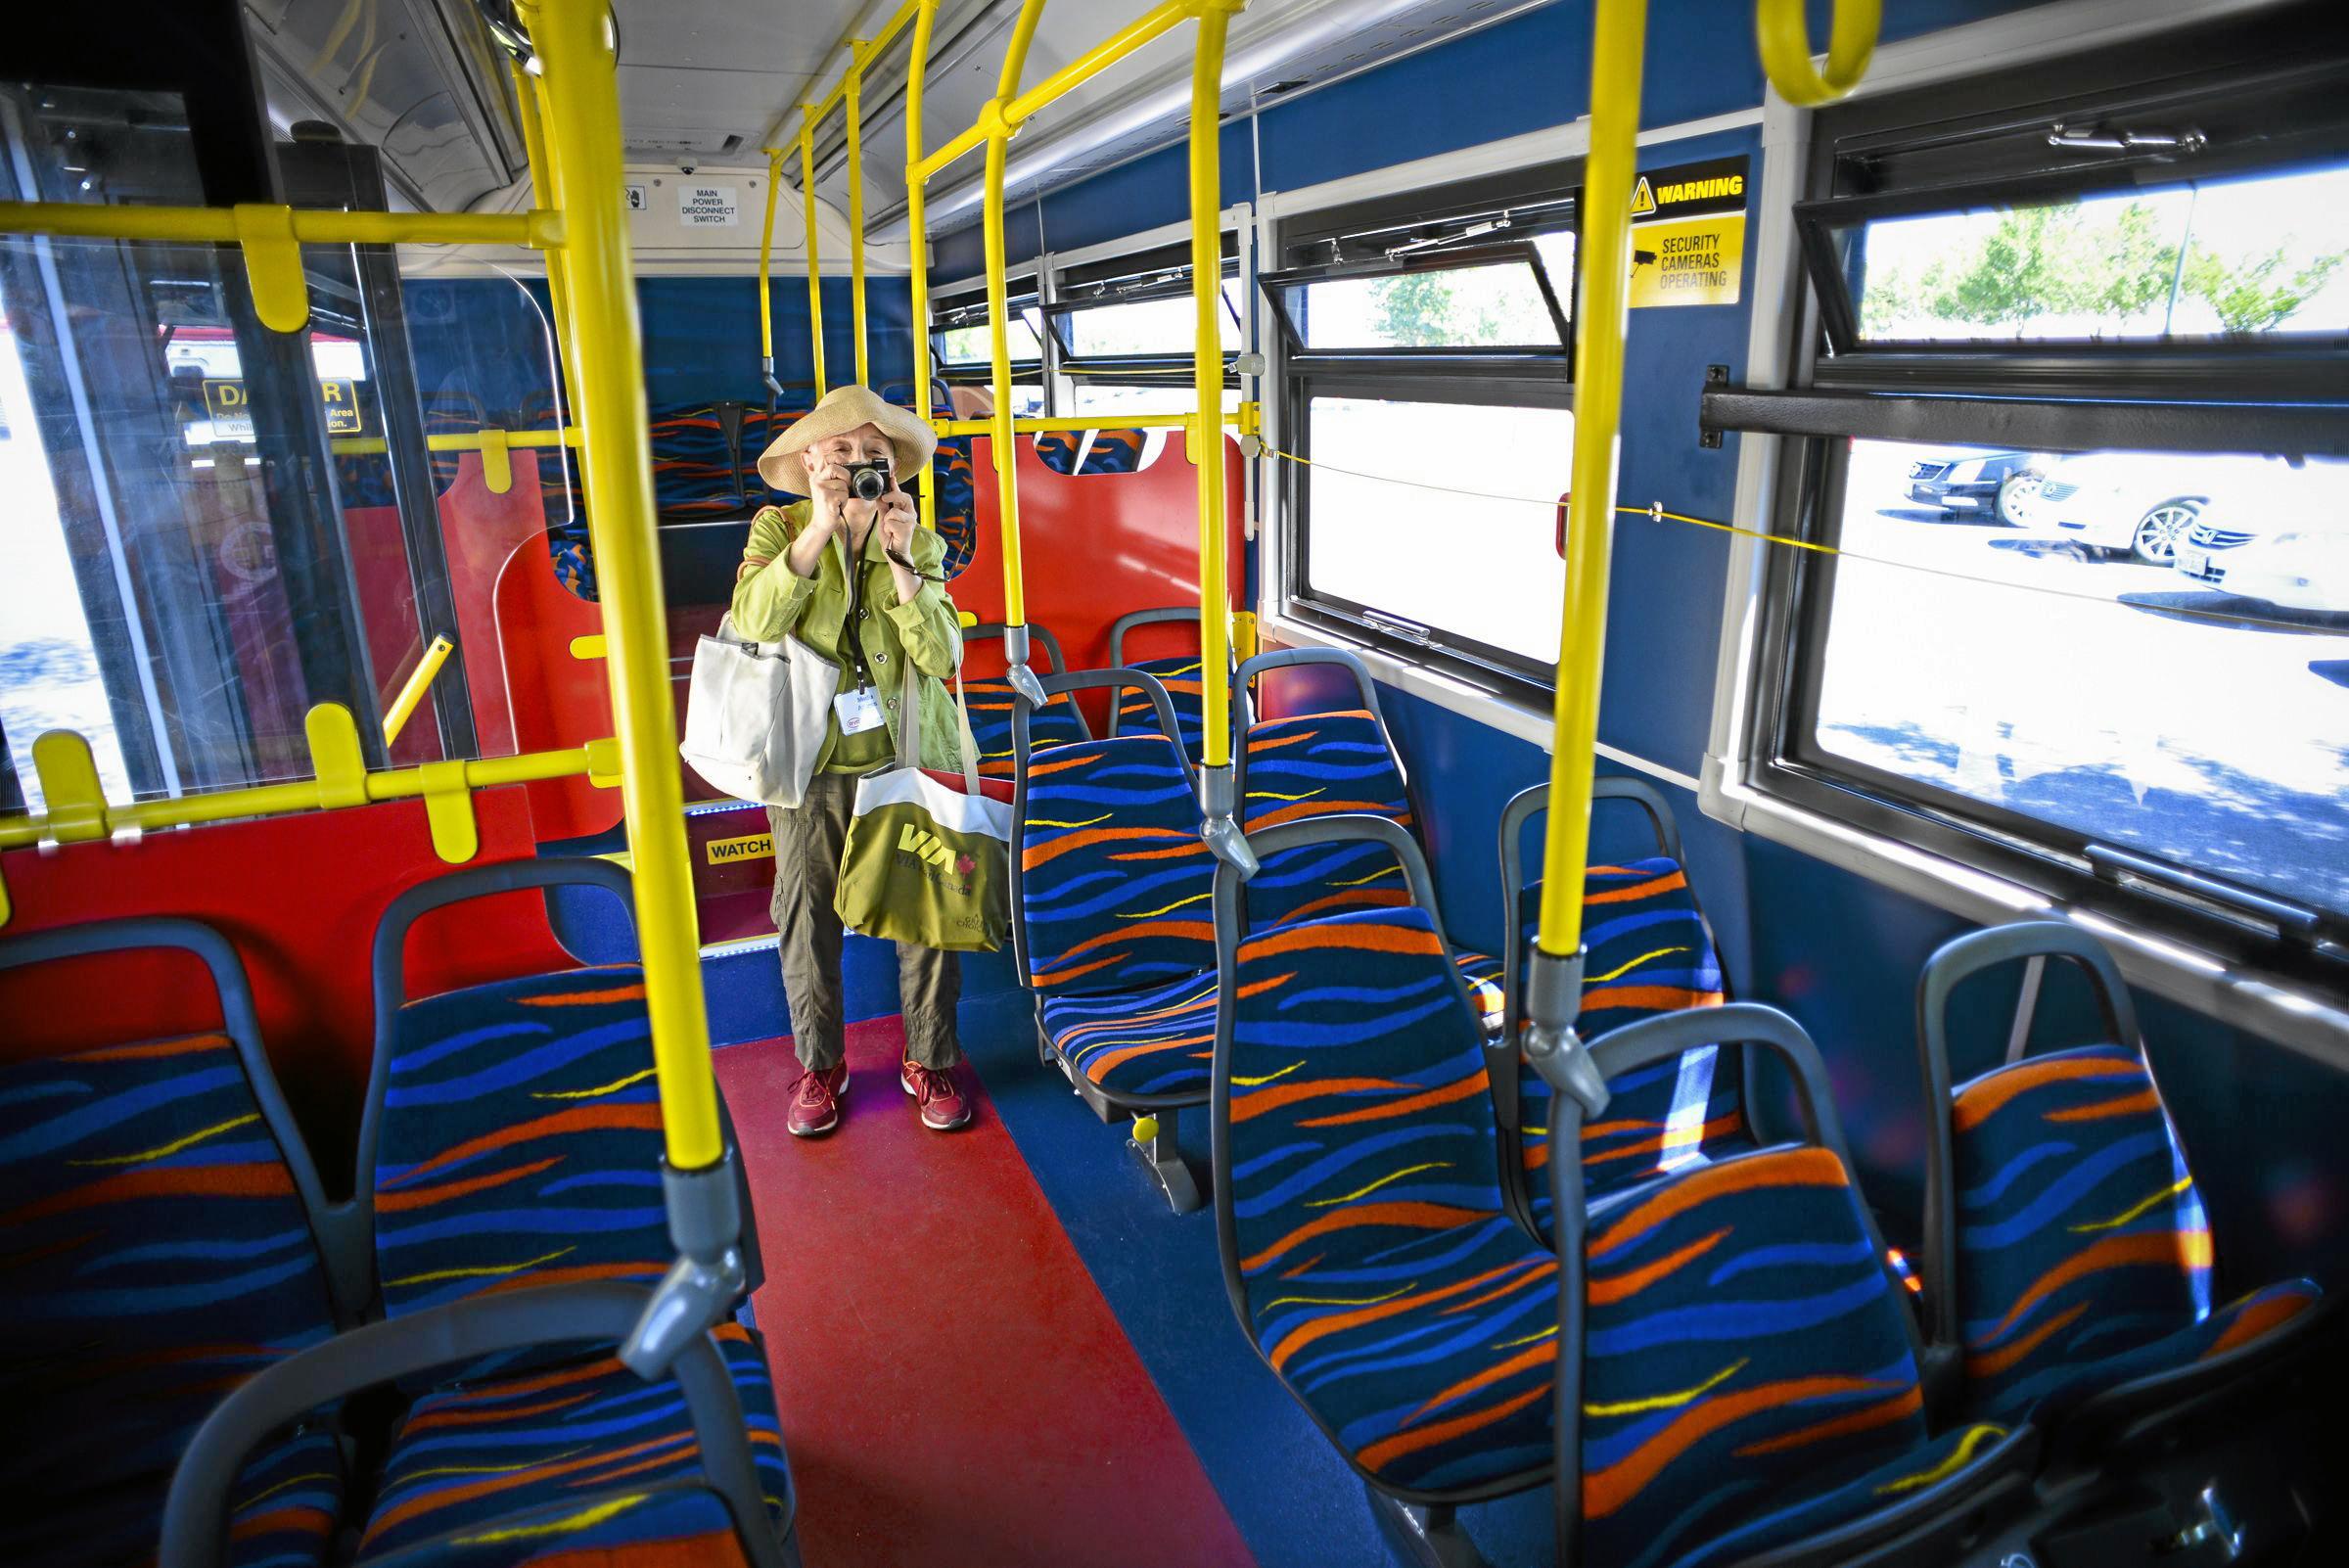 Mulher dentro de um ônibus (© AP Images)